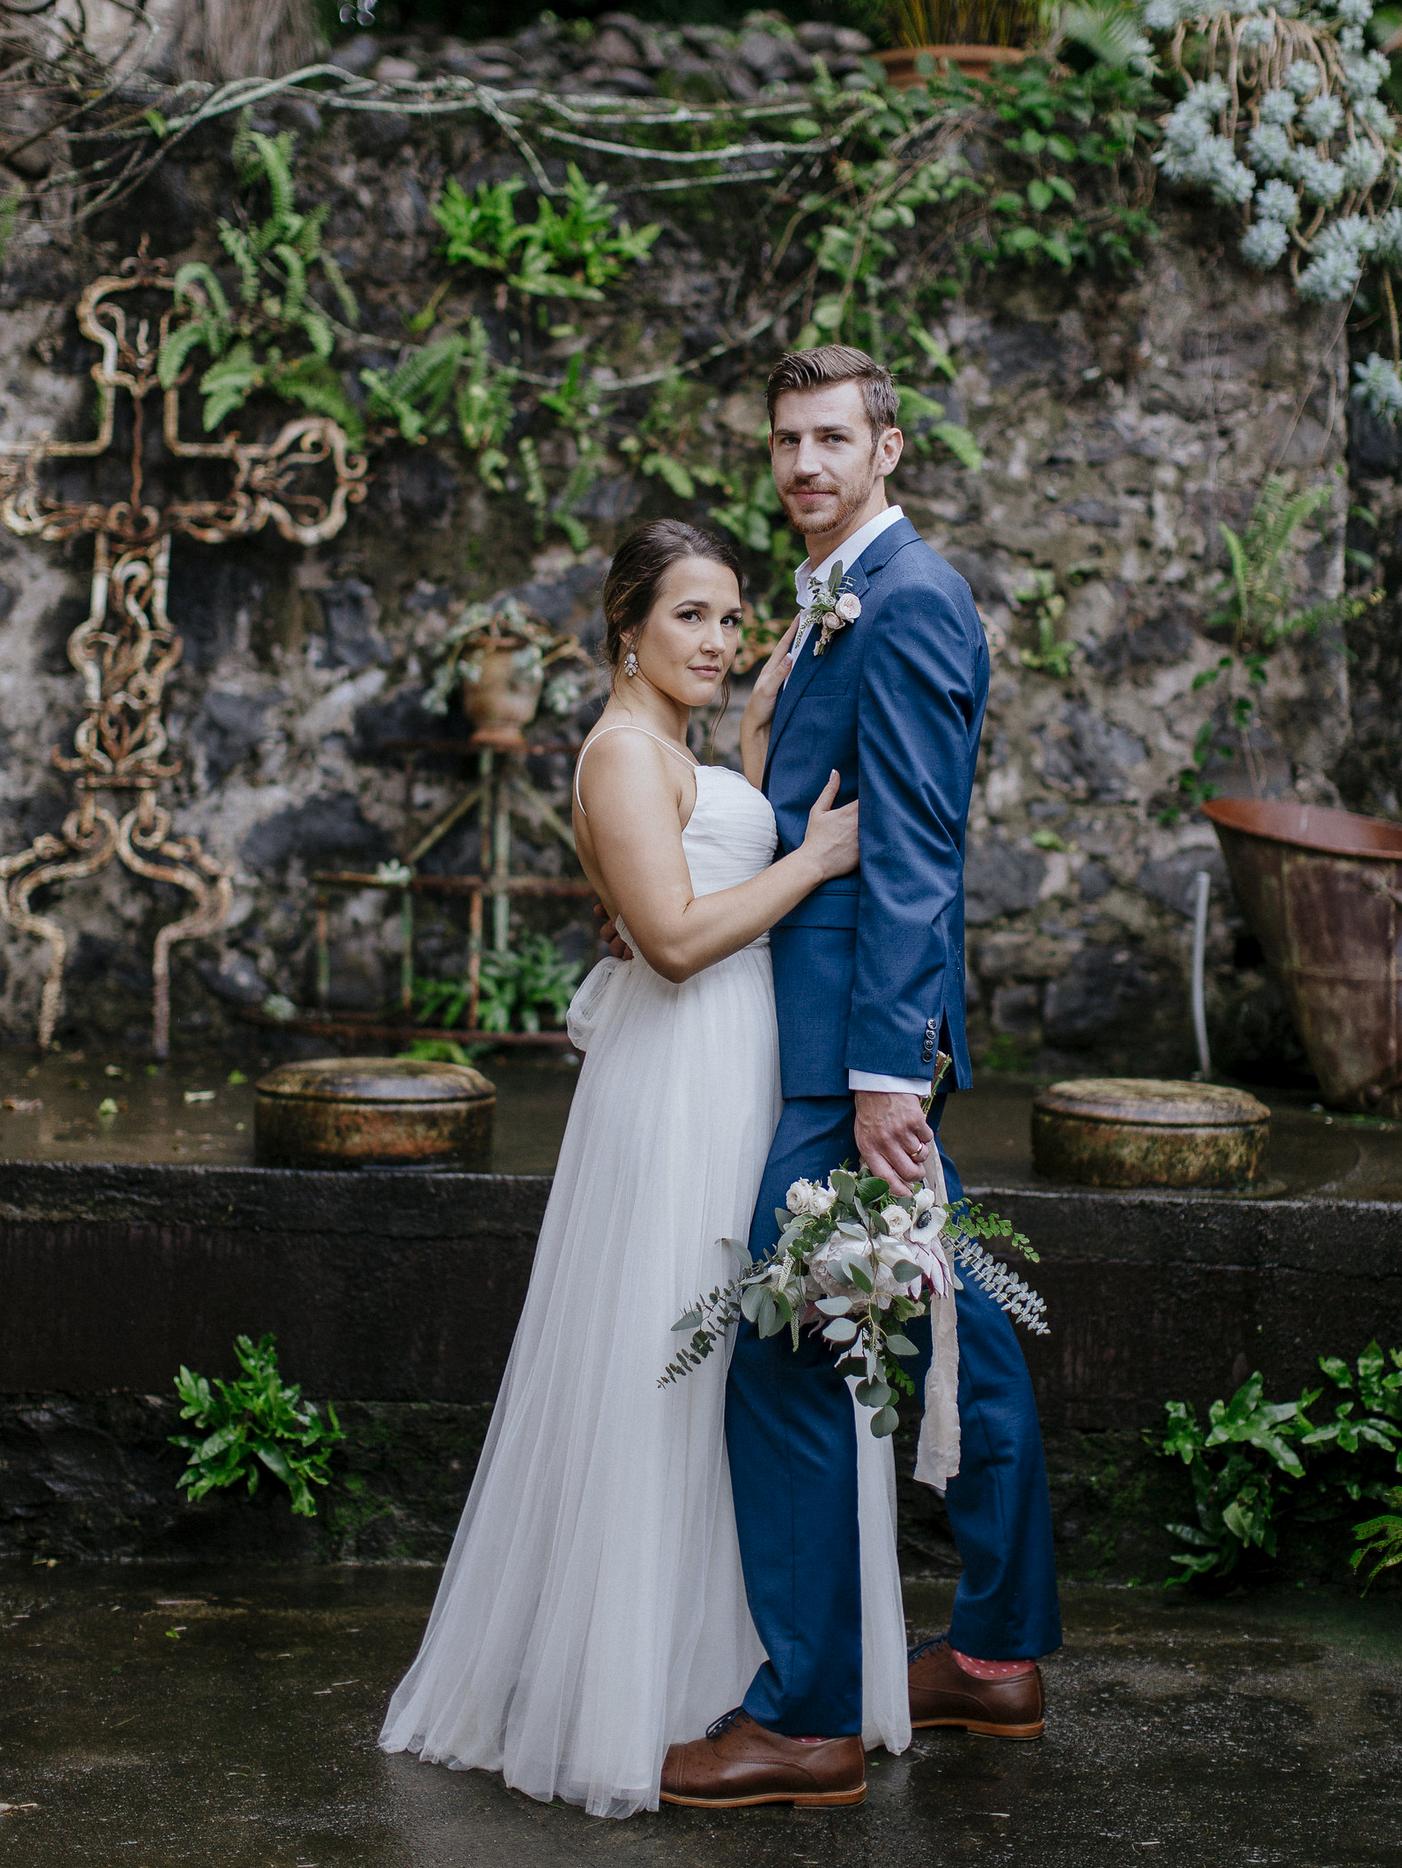 chris-j-evans-rain-wedding00006.png